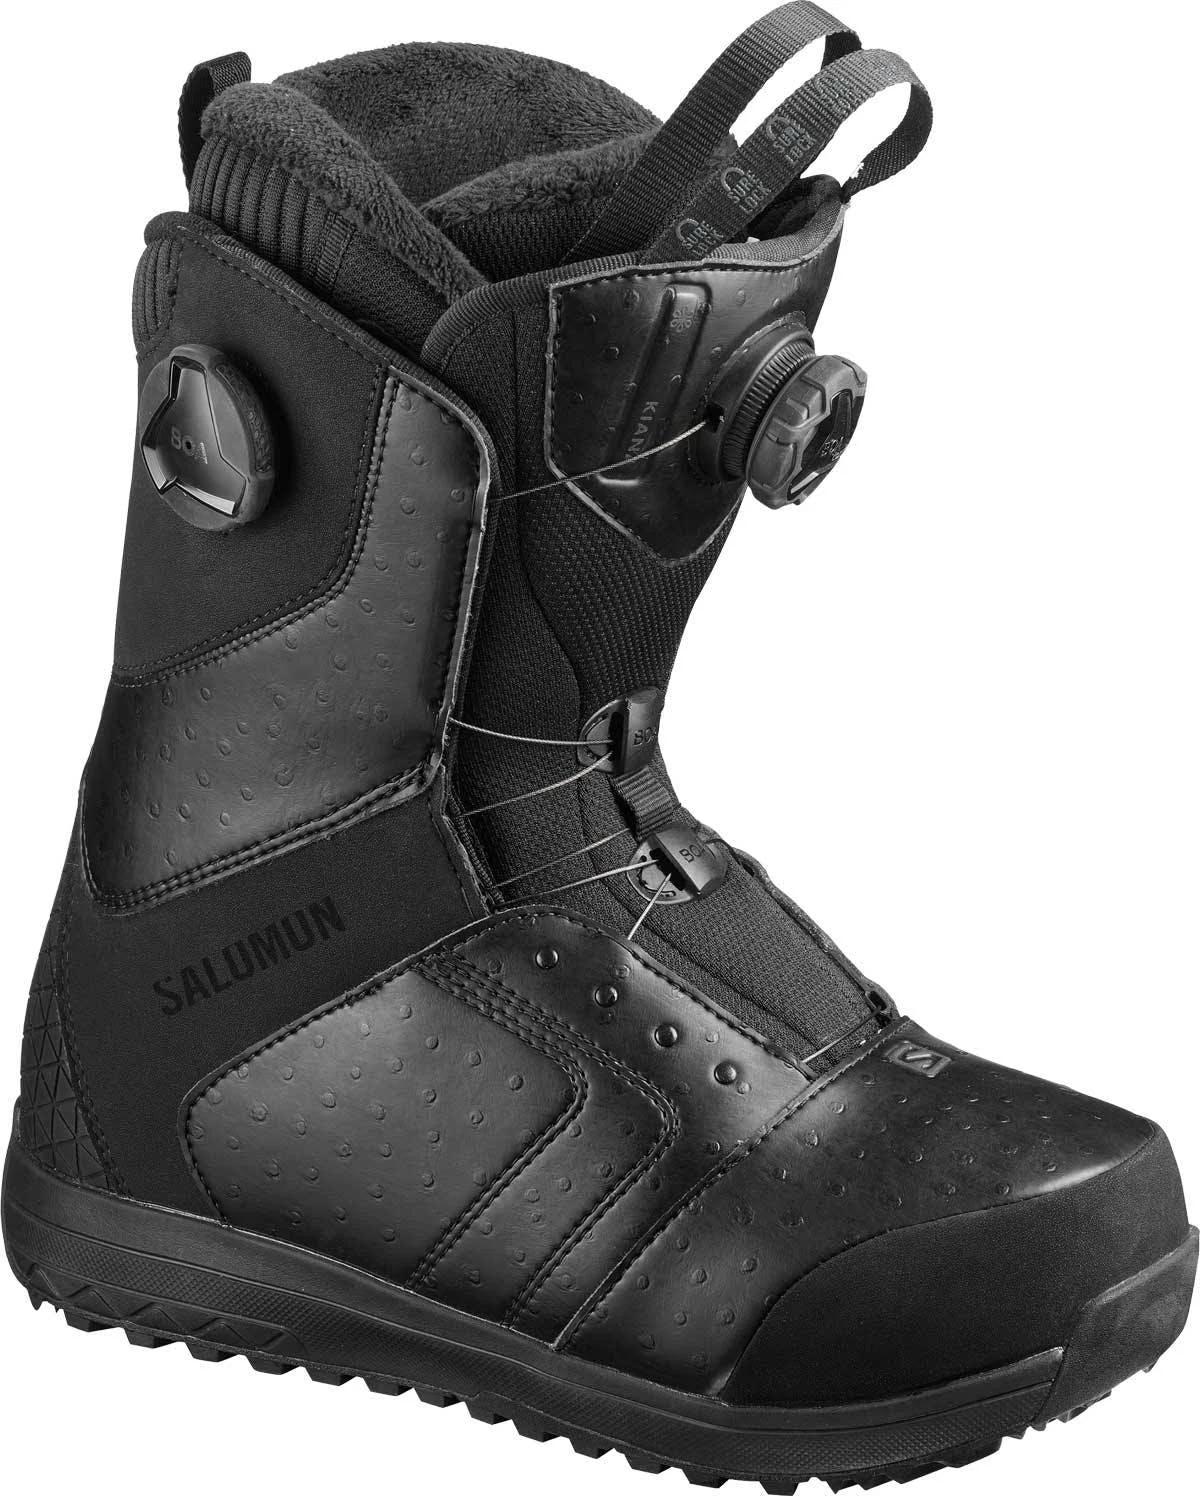 Salomon Women's Kiana Focus BOA Snowboard Boots Black 7